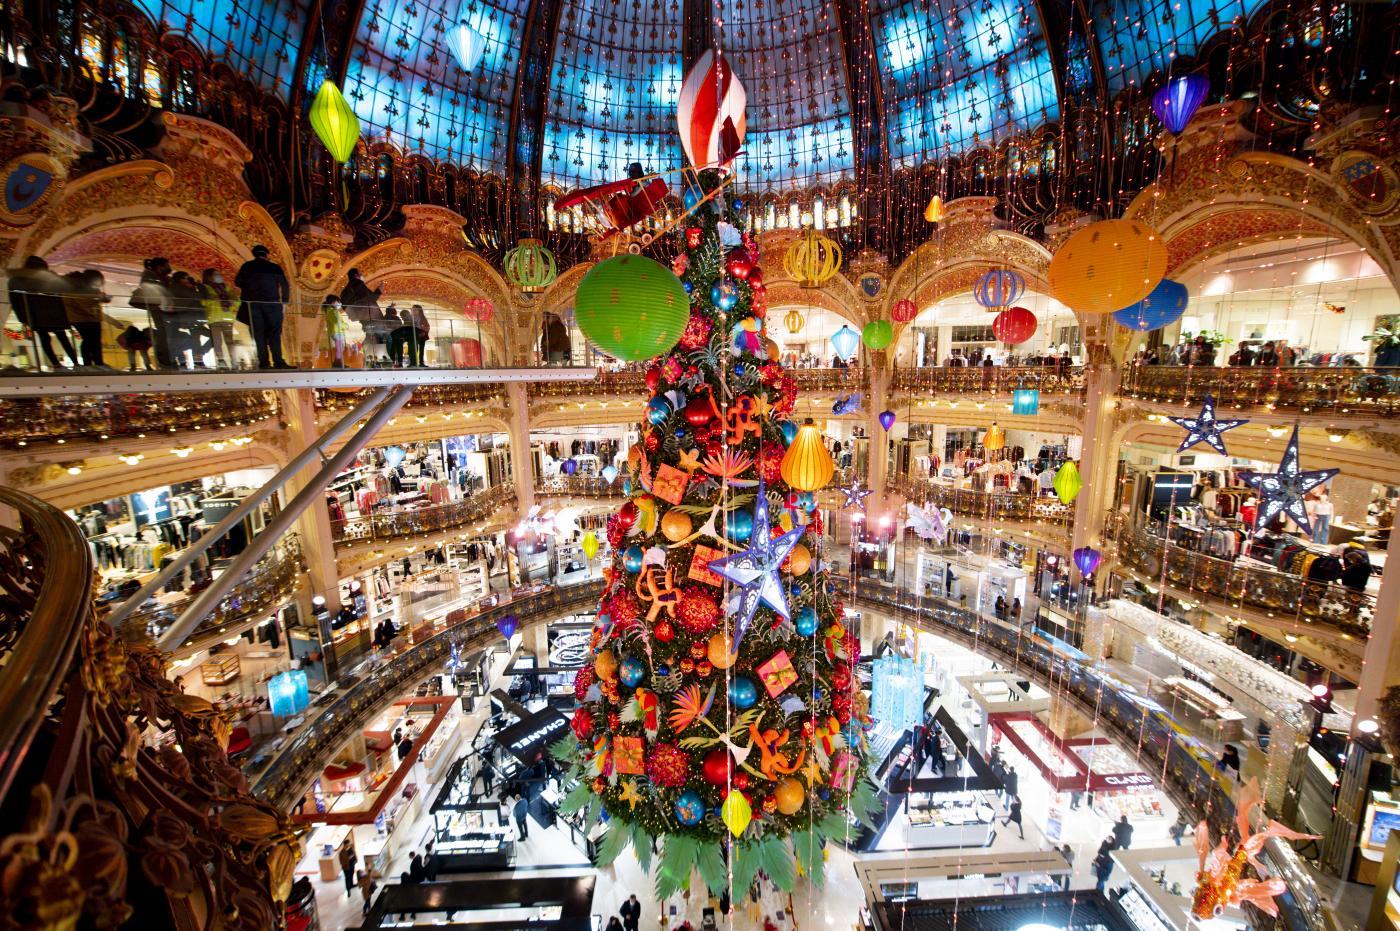 Le splendide decorazioni natalizie di Galeries Lafayette a Parigi